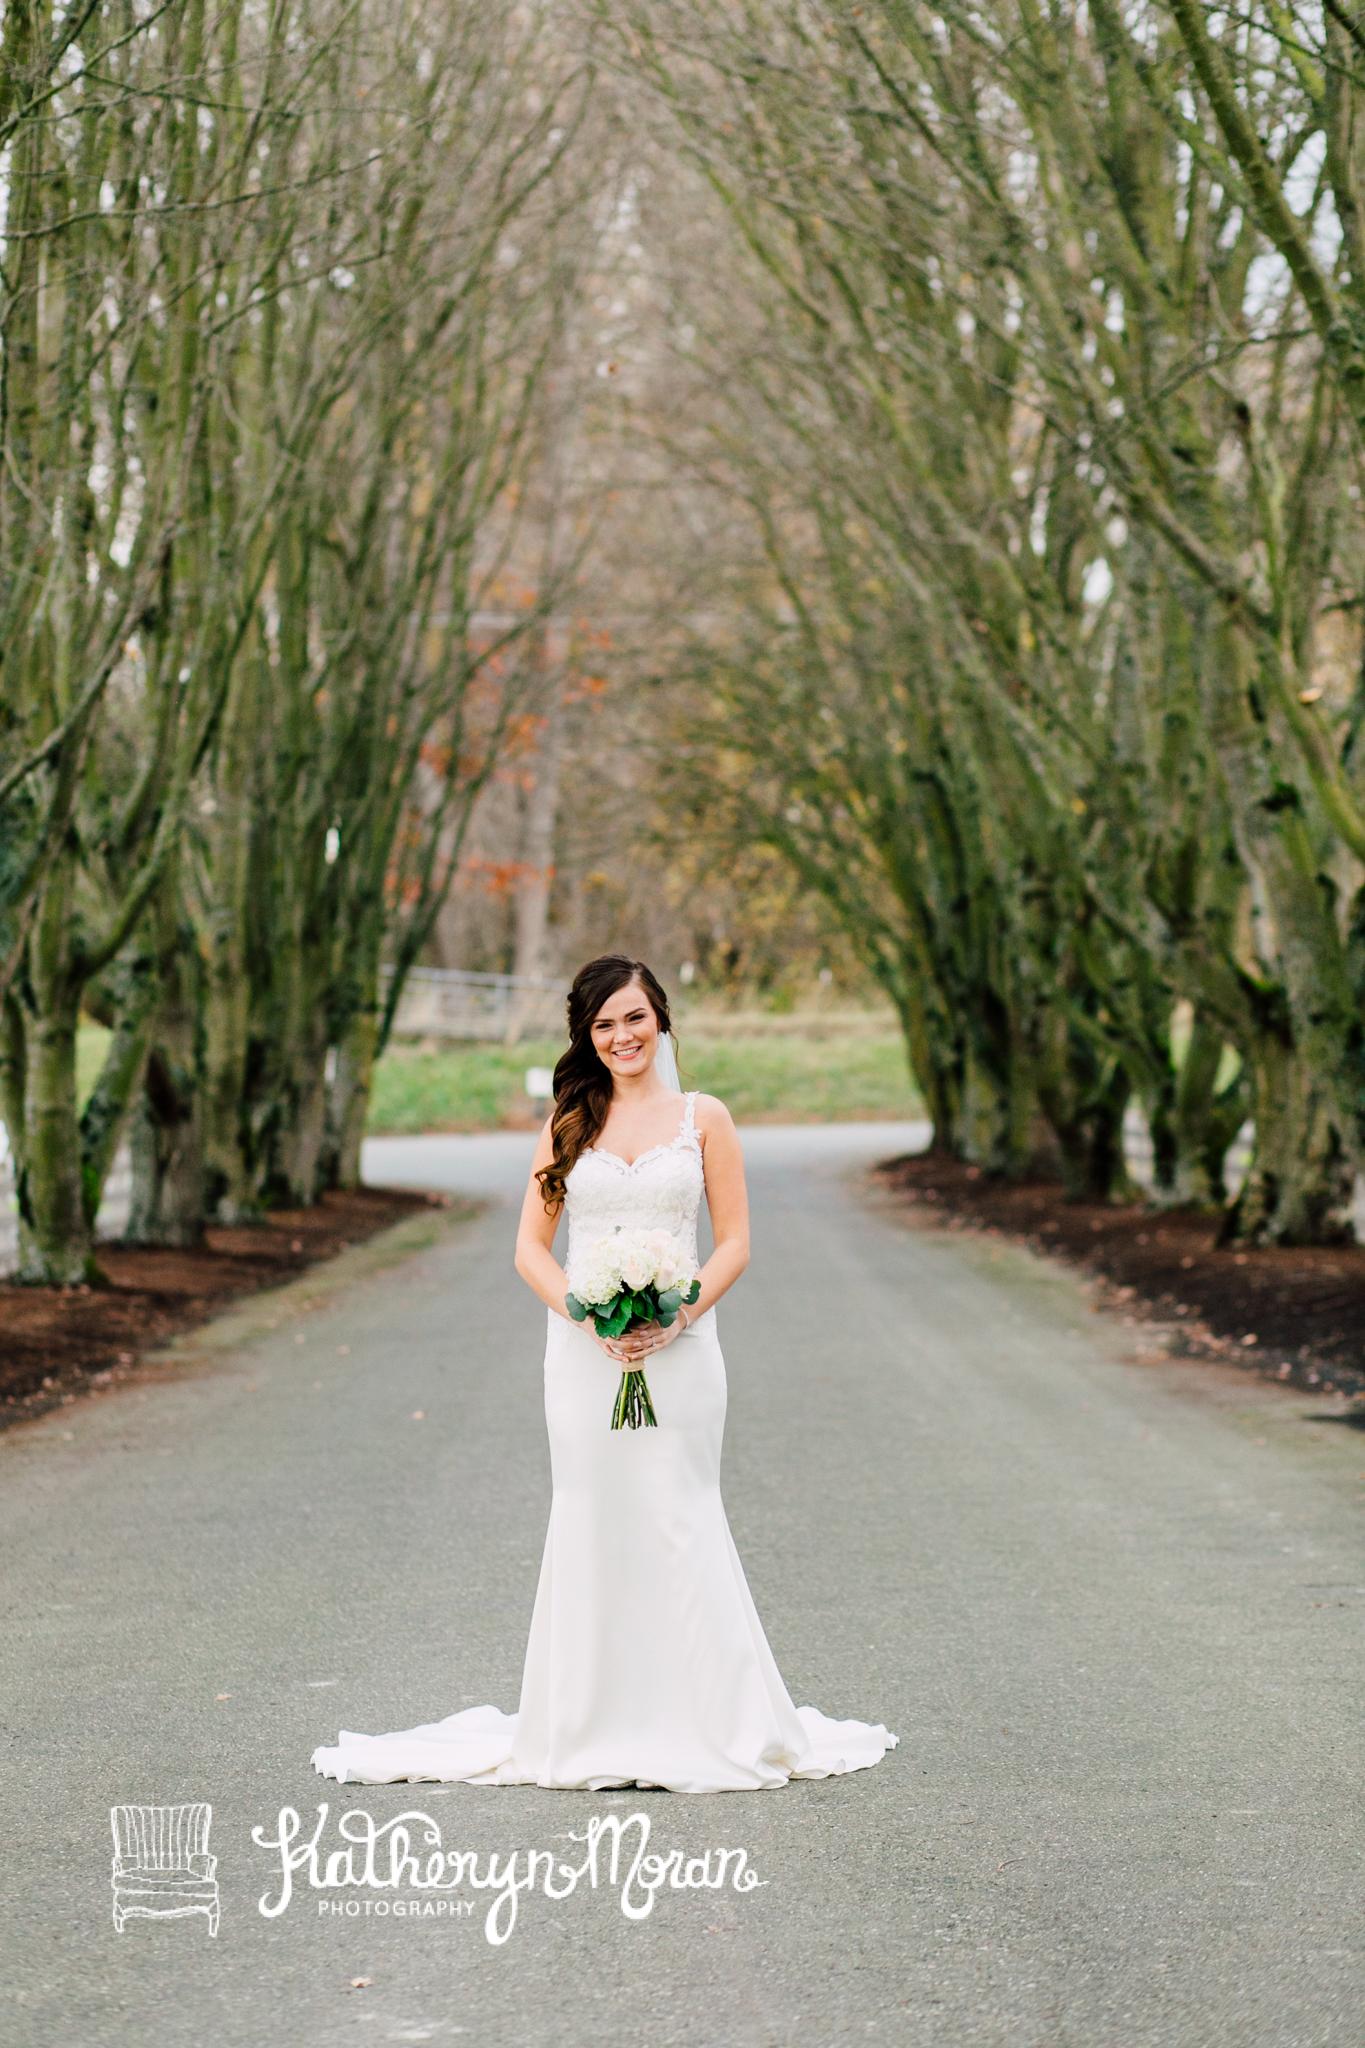 maplehurst-farm-wedding-katheryn-moran-photography-koogle-9.jpg